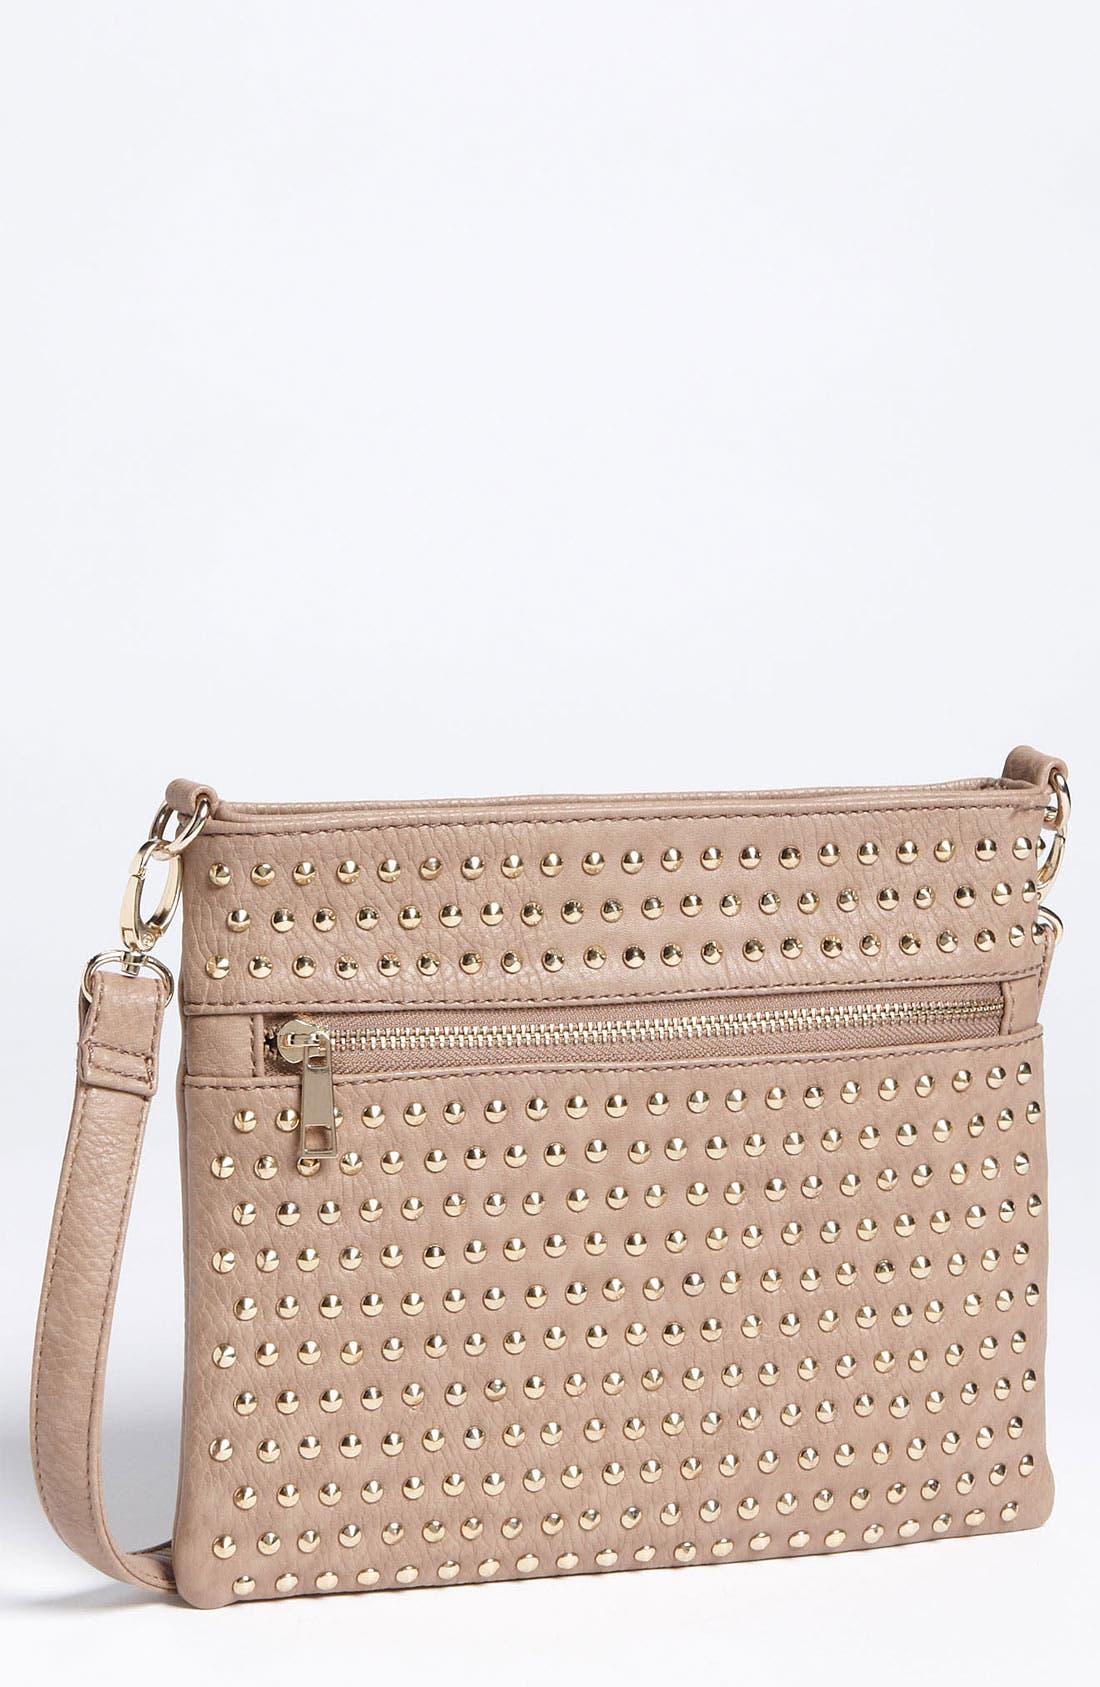 Studded Convertible Crossbody Bag,                             Main thumbnail 1, color,                             Taupe/ Gold